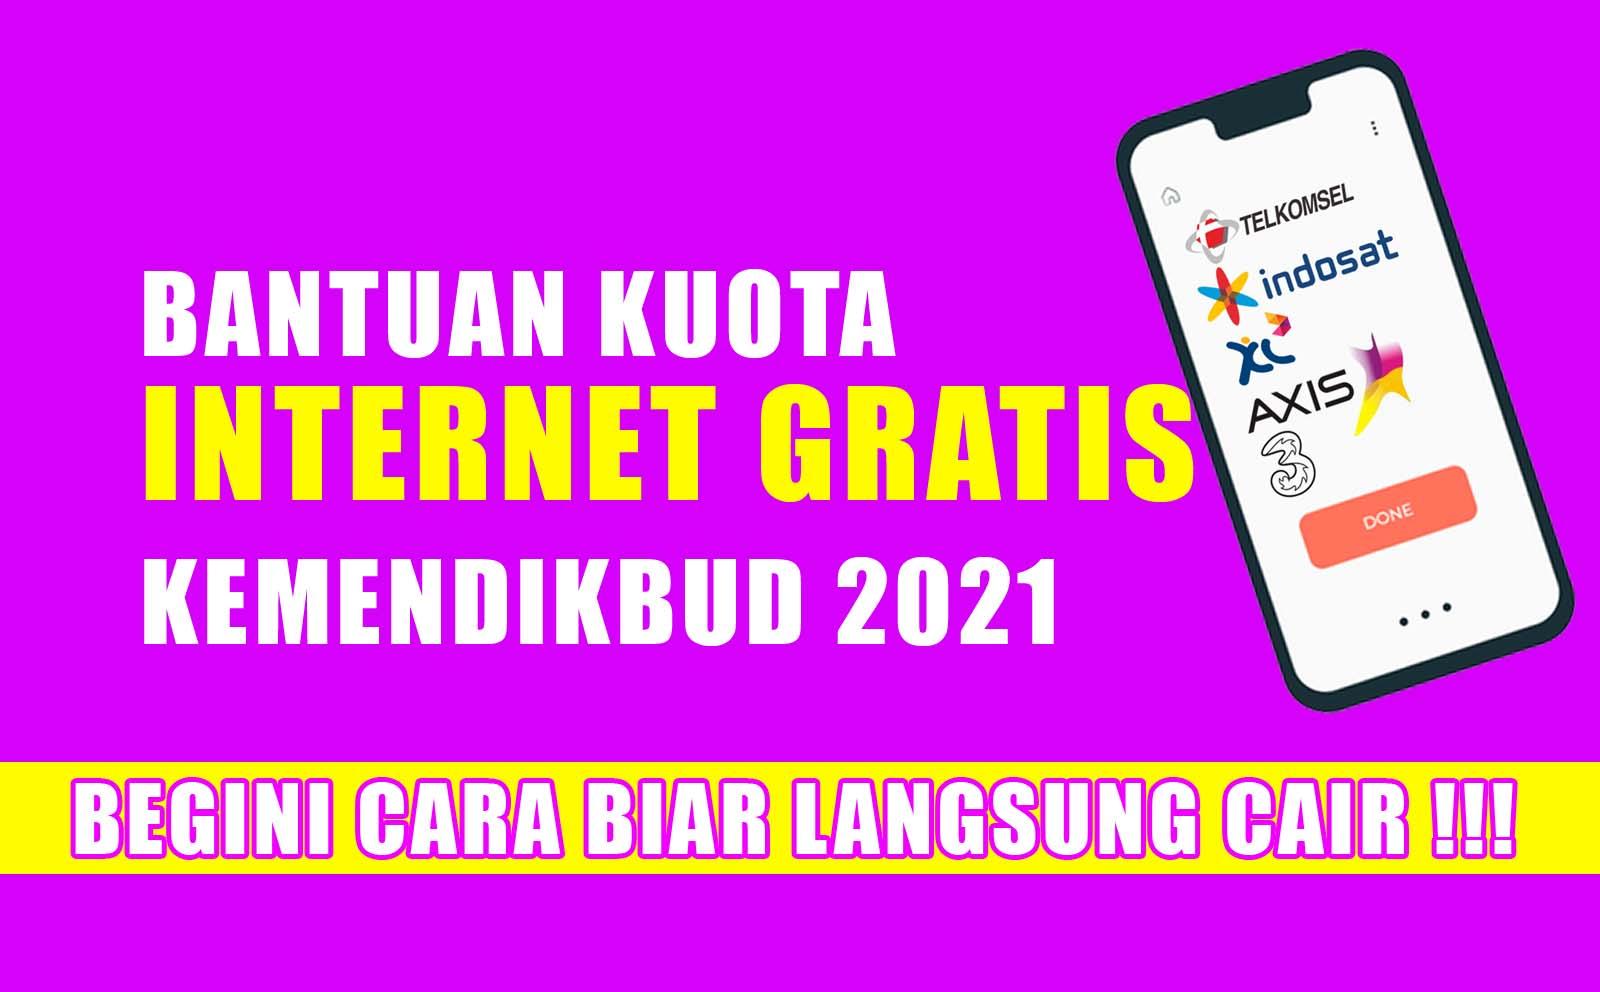 Kuota Internet Gratis 2021